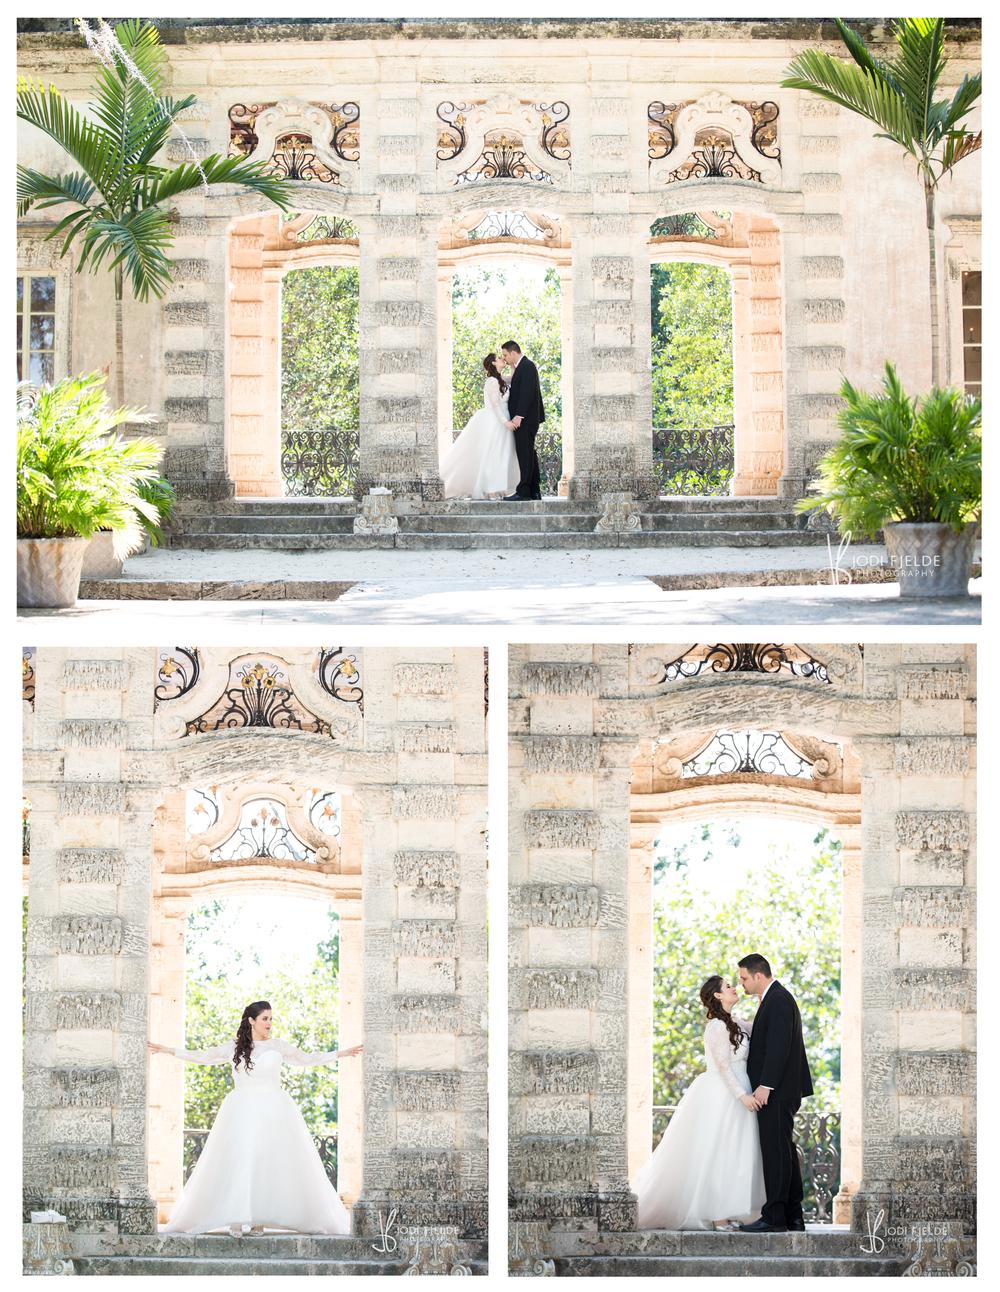 Vizcaya_Miami_Florida_Bridal_Wedding_Portraits_Jodi_Fjelde_Photography-6.jpg